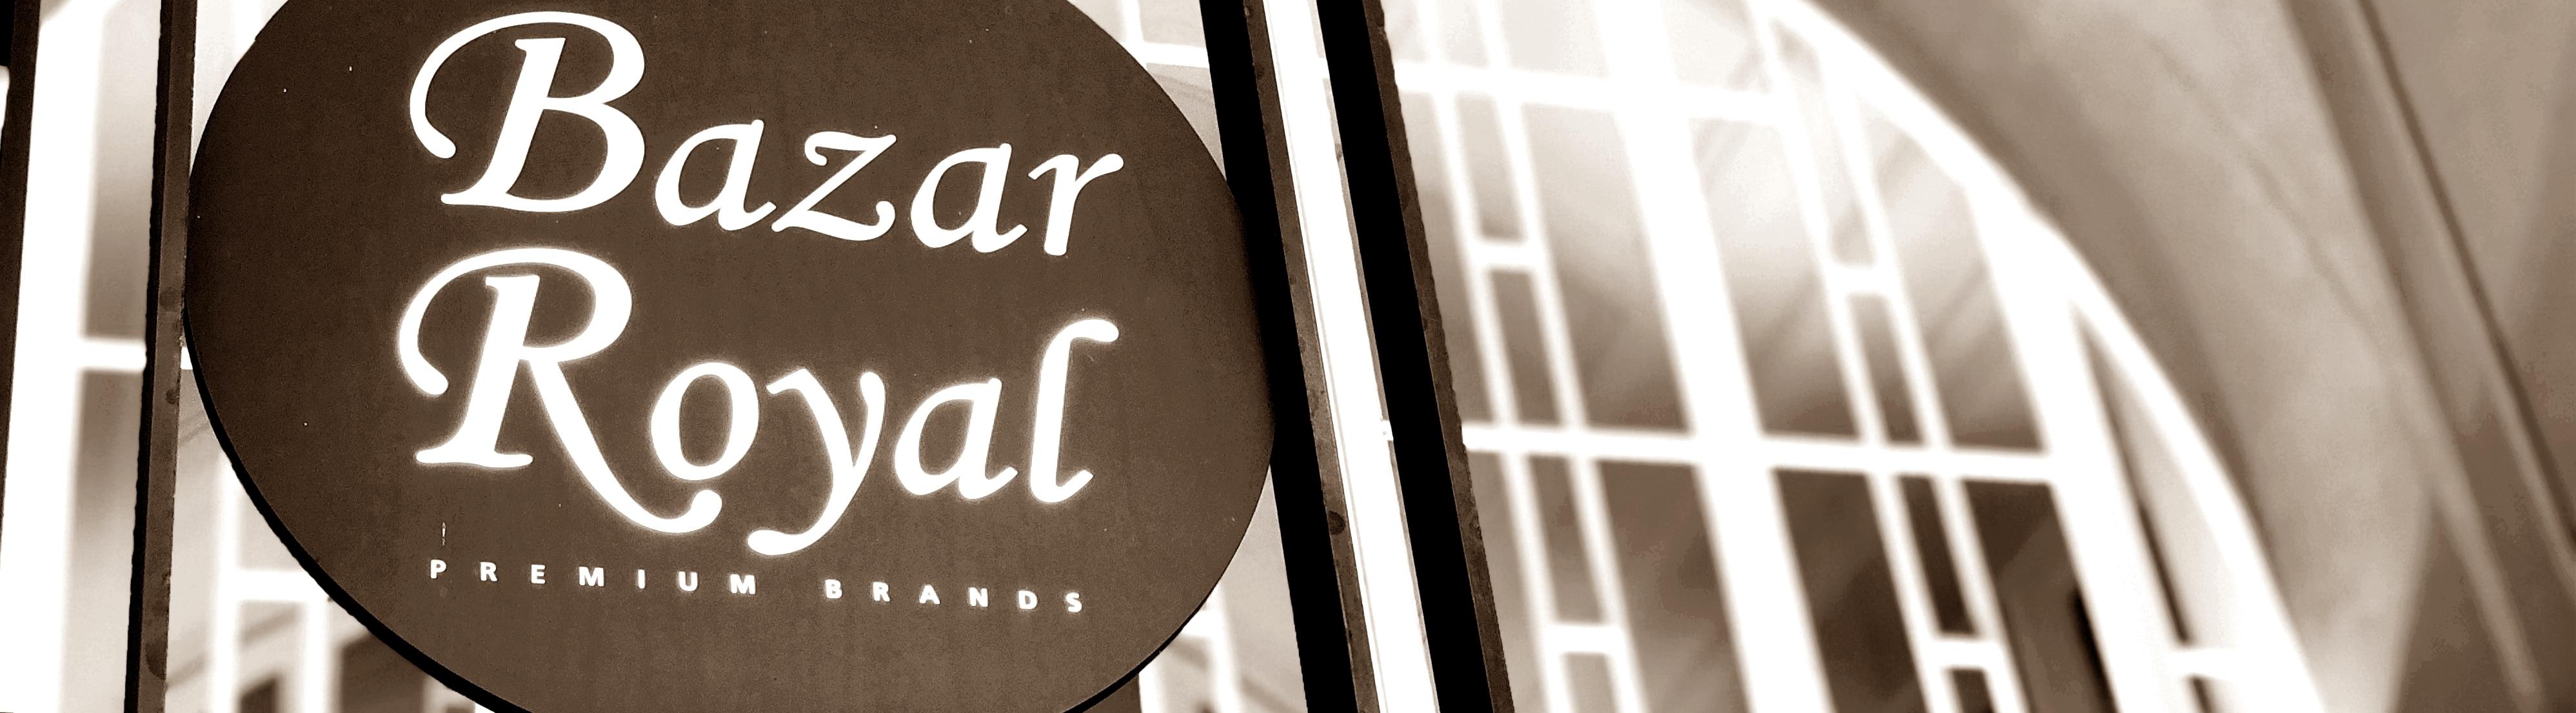 Bazar Royal